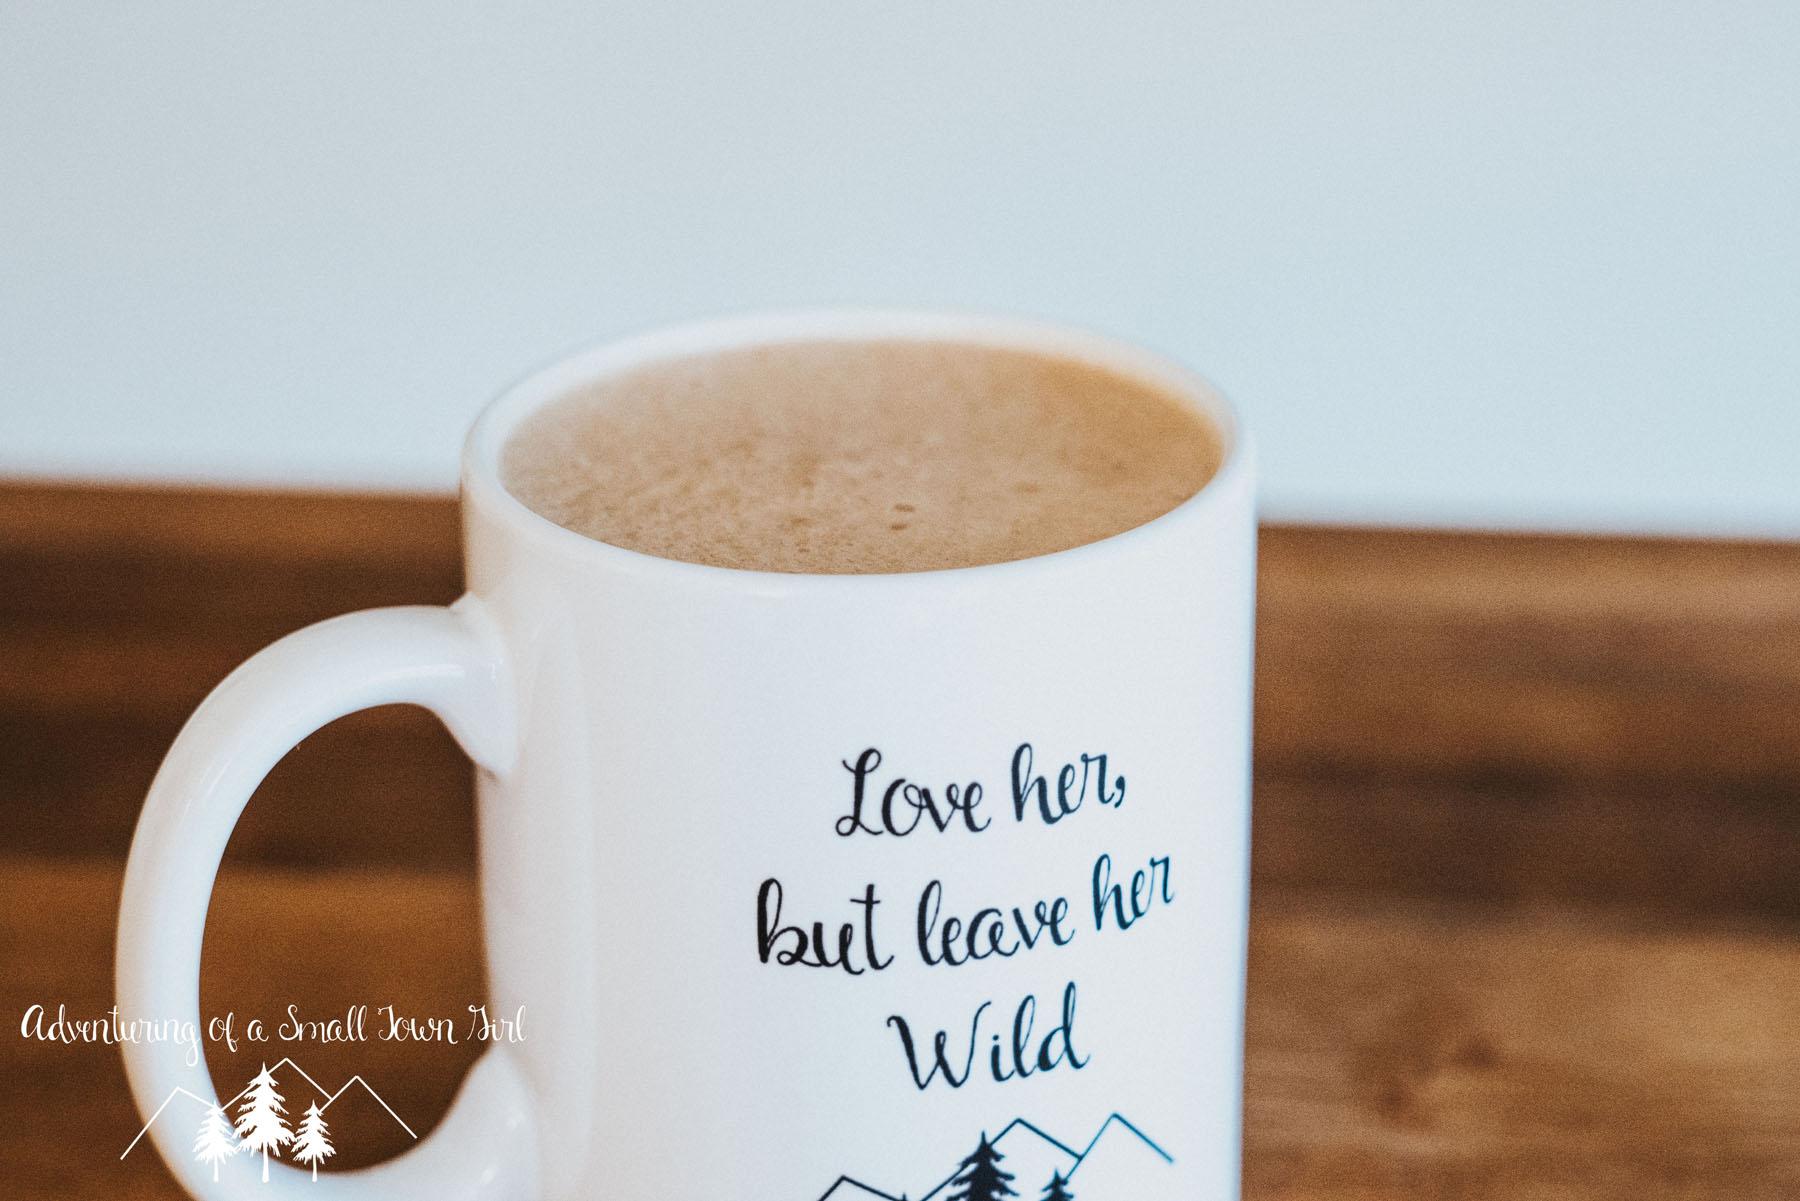 Healthy Latte Recipe - Starbucks Hack - Adventuring of a Small Town Girl-11.jpg